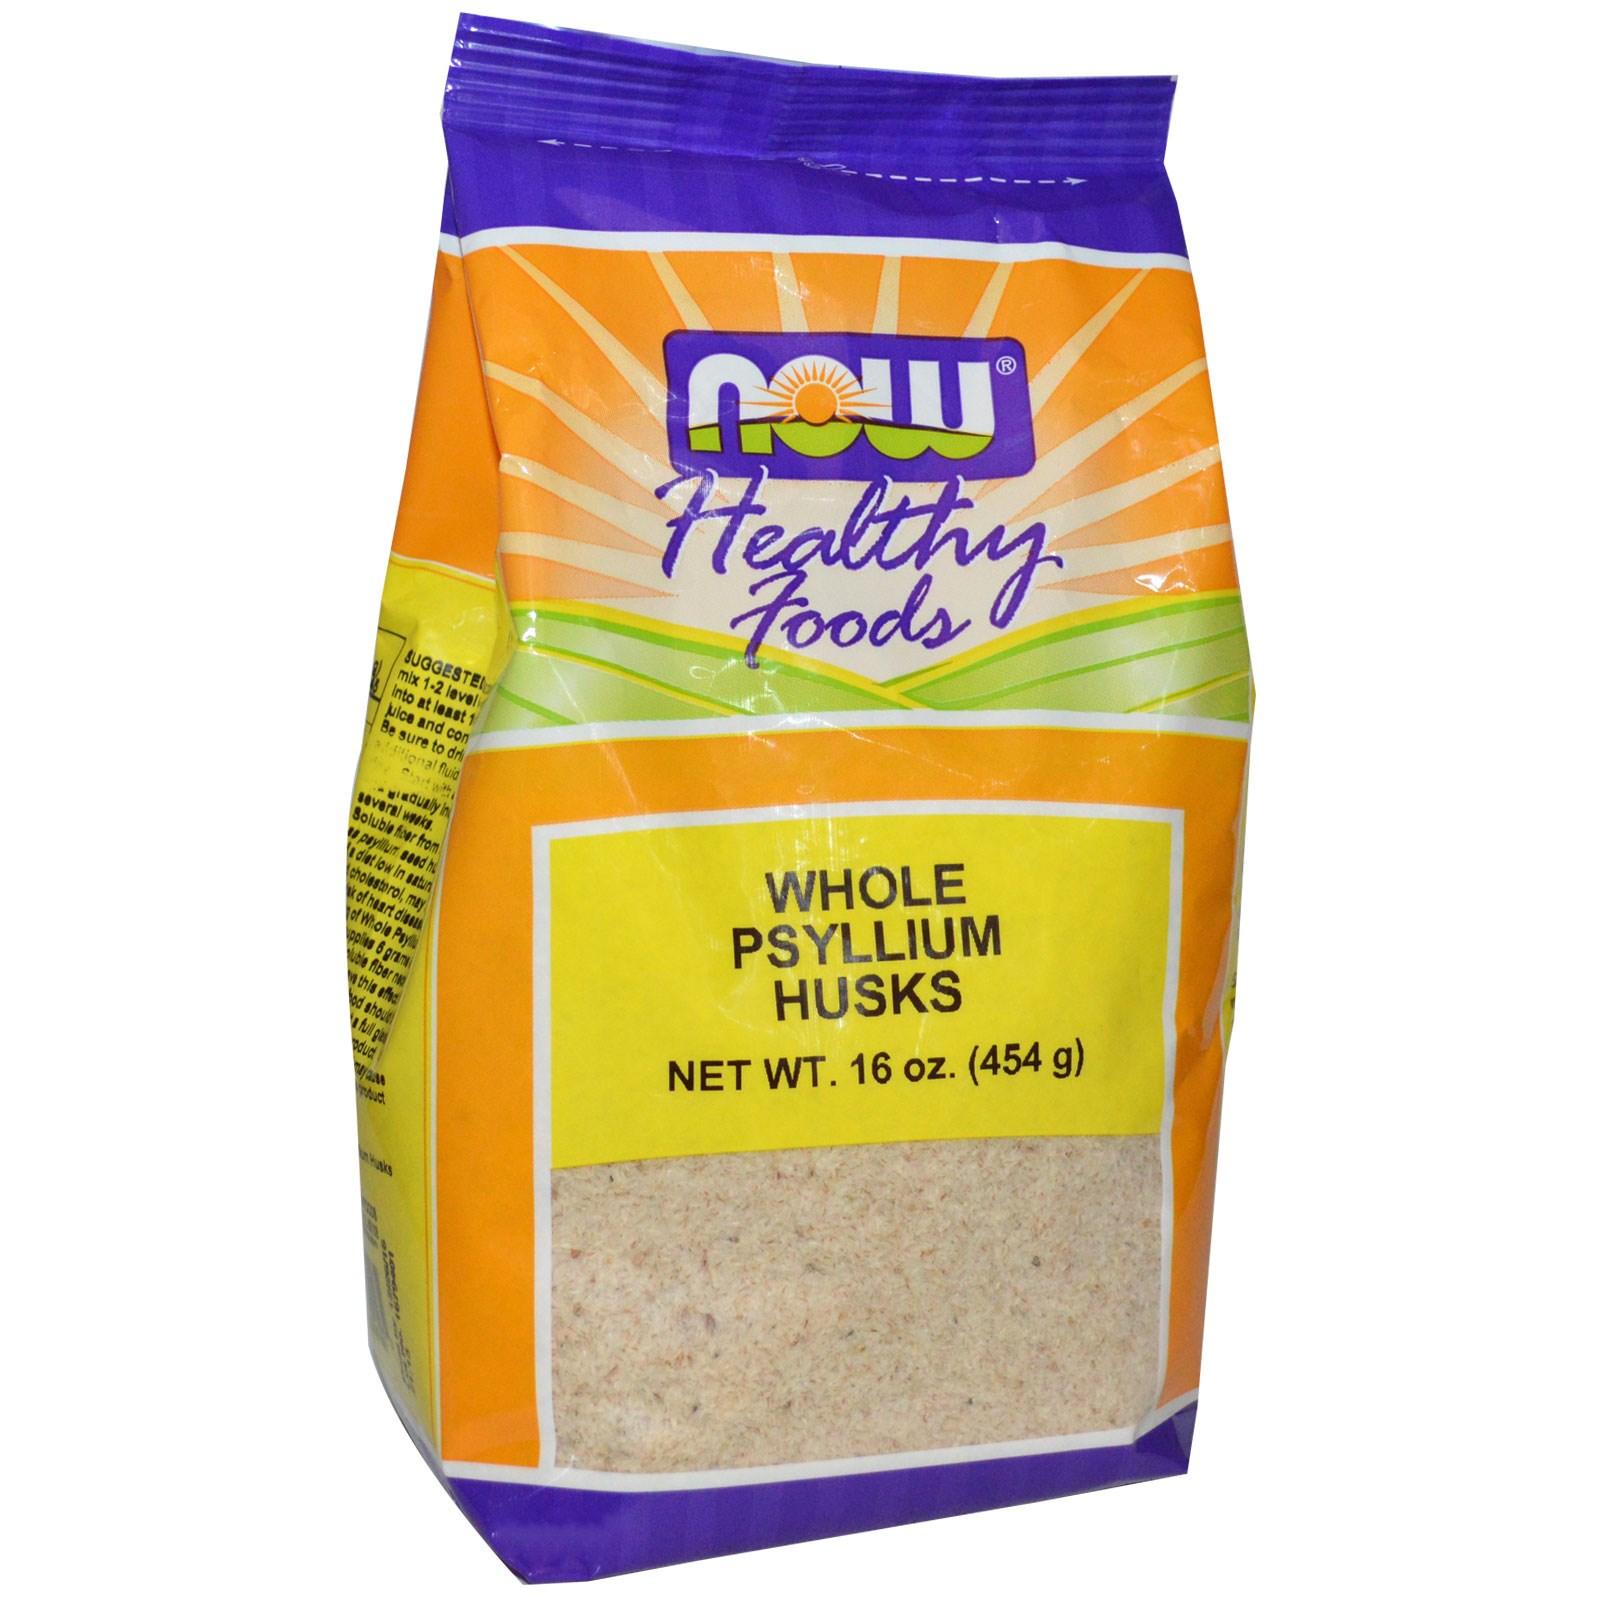 Image of Whole Psyllium Husks (454 gram) - Now Foods 0733739059819